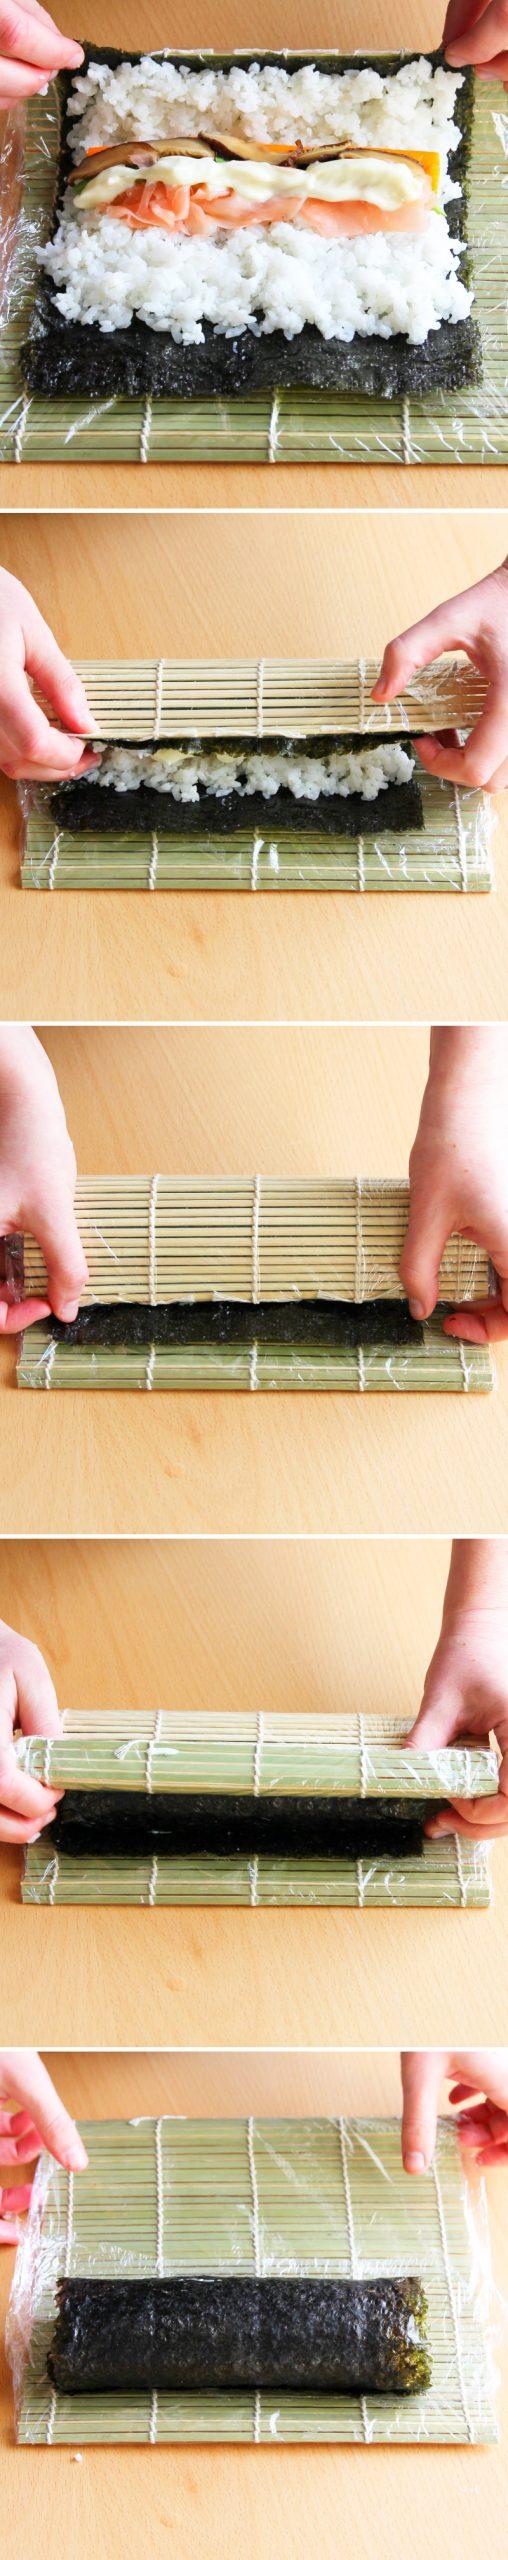 Futomaki Schritt 9 Sushi-Rolle formen